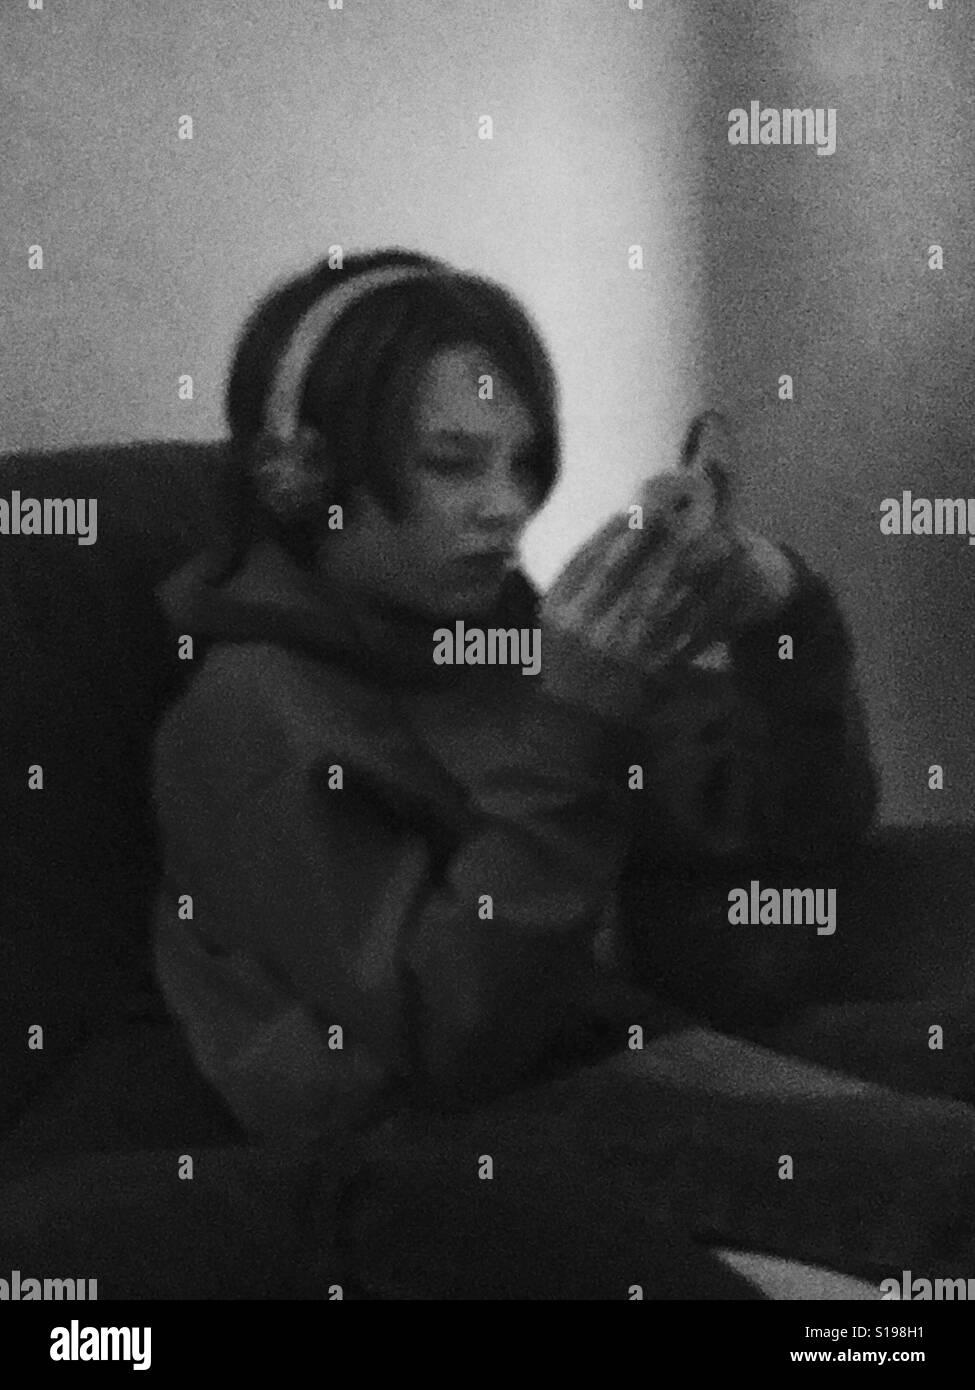 Blurry technology boy - Stock Image